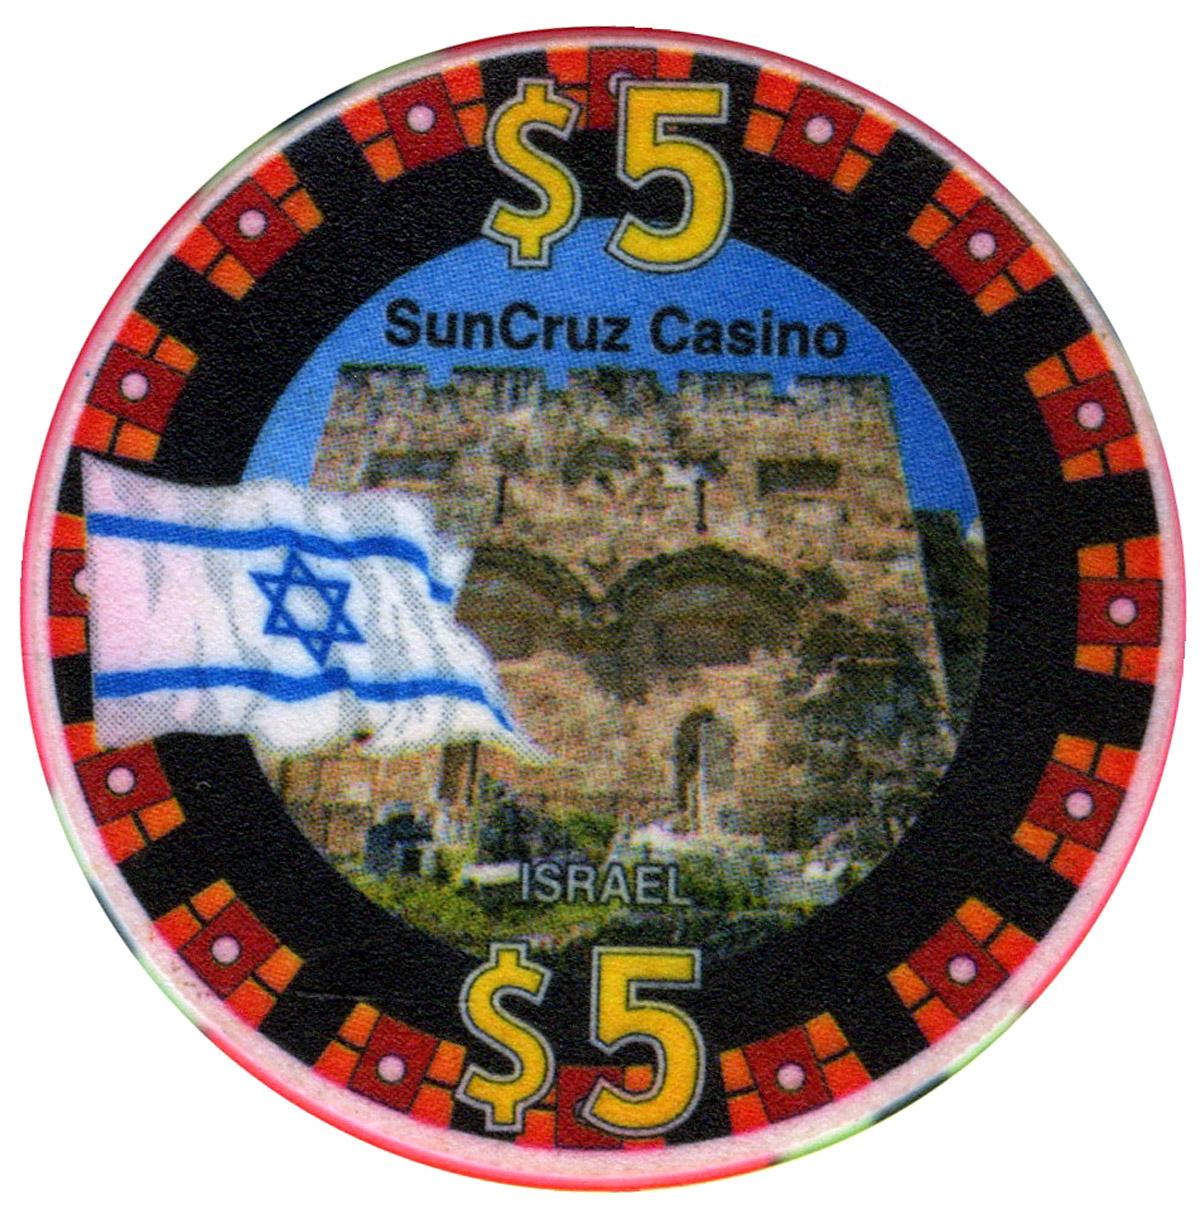 Israel casino cruise empress casino gambling boat